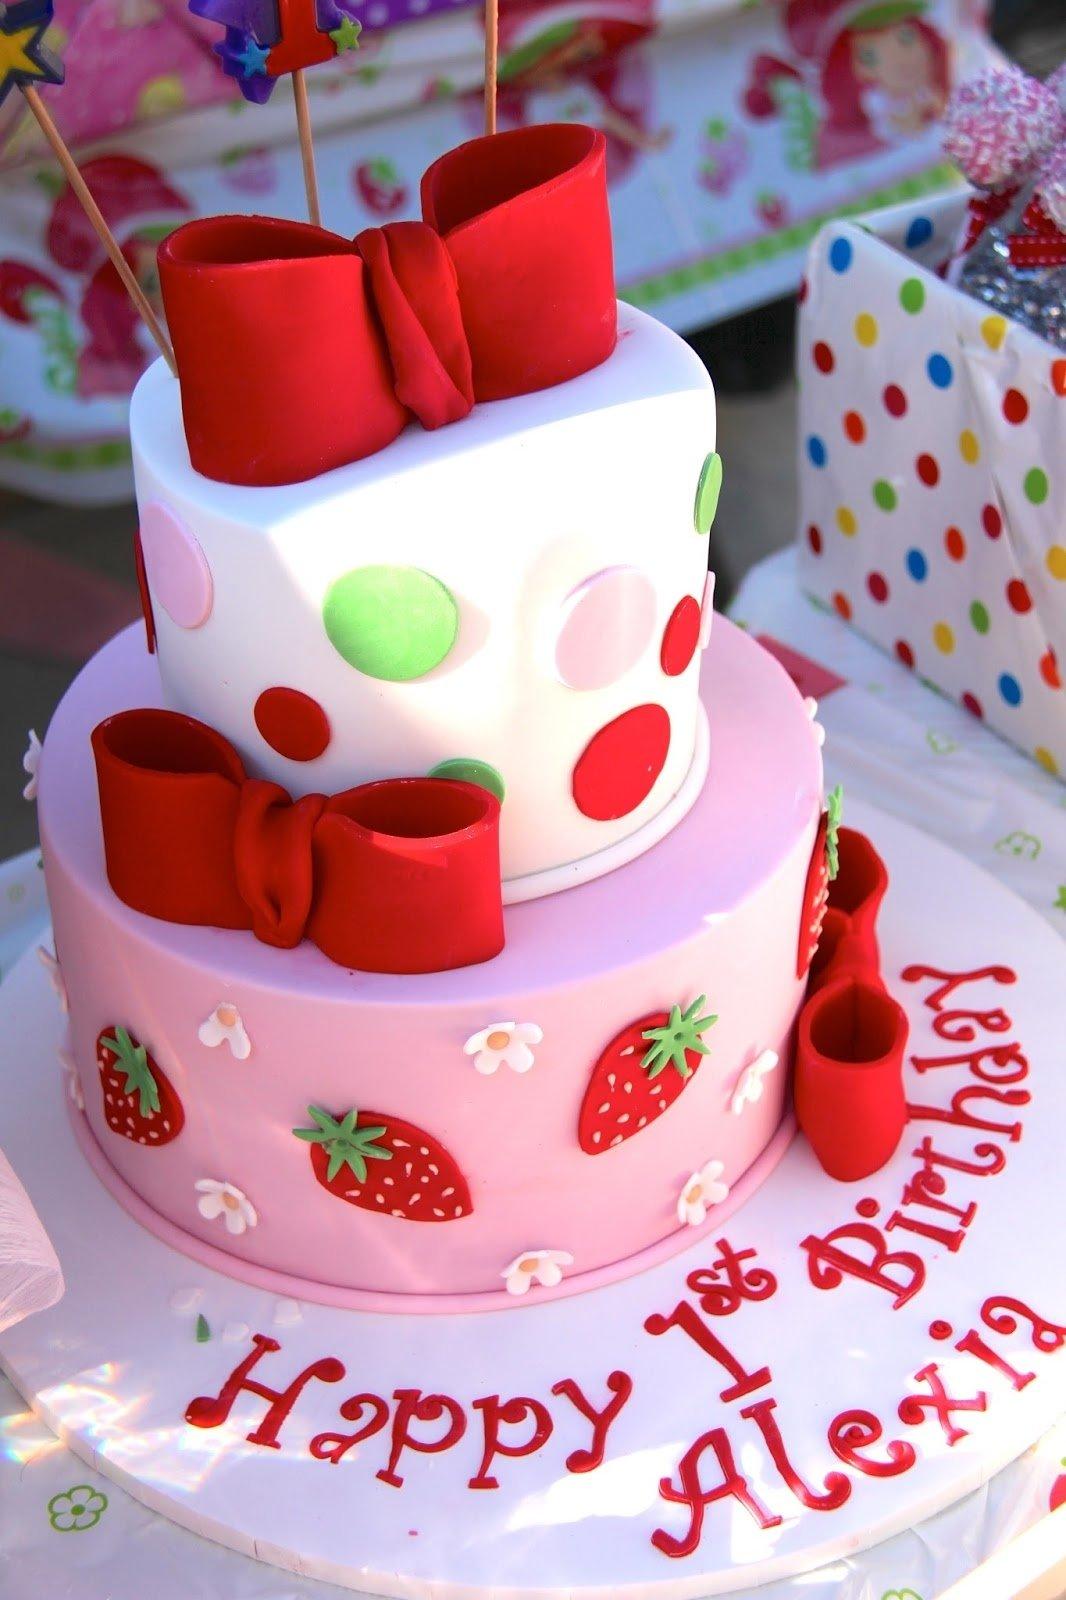 10 Attractive Strawberry Shortcake Birthday Cake Ideas party ideas strawberry shortcake themed birthday and diy lemonade 1 2020